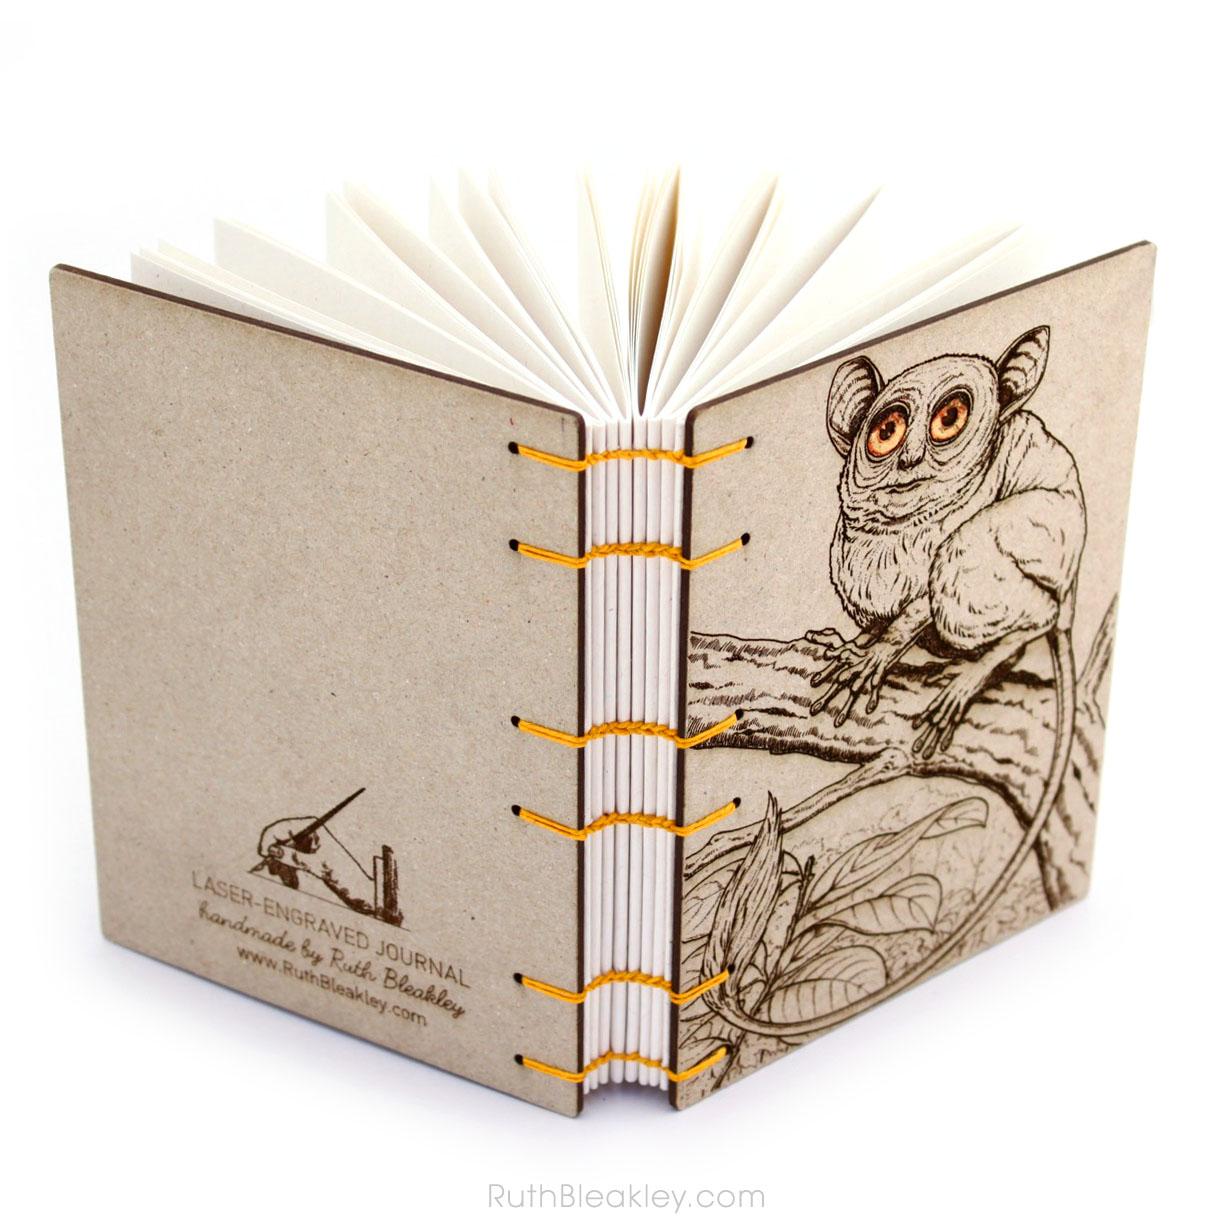 Koboldmaki laser engraved journal handmade by book artist Ruth Bleakley - coptic stitch